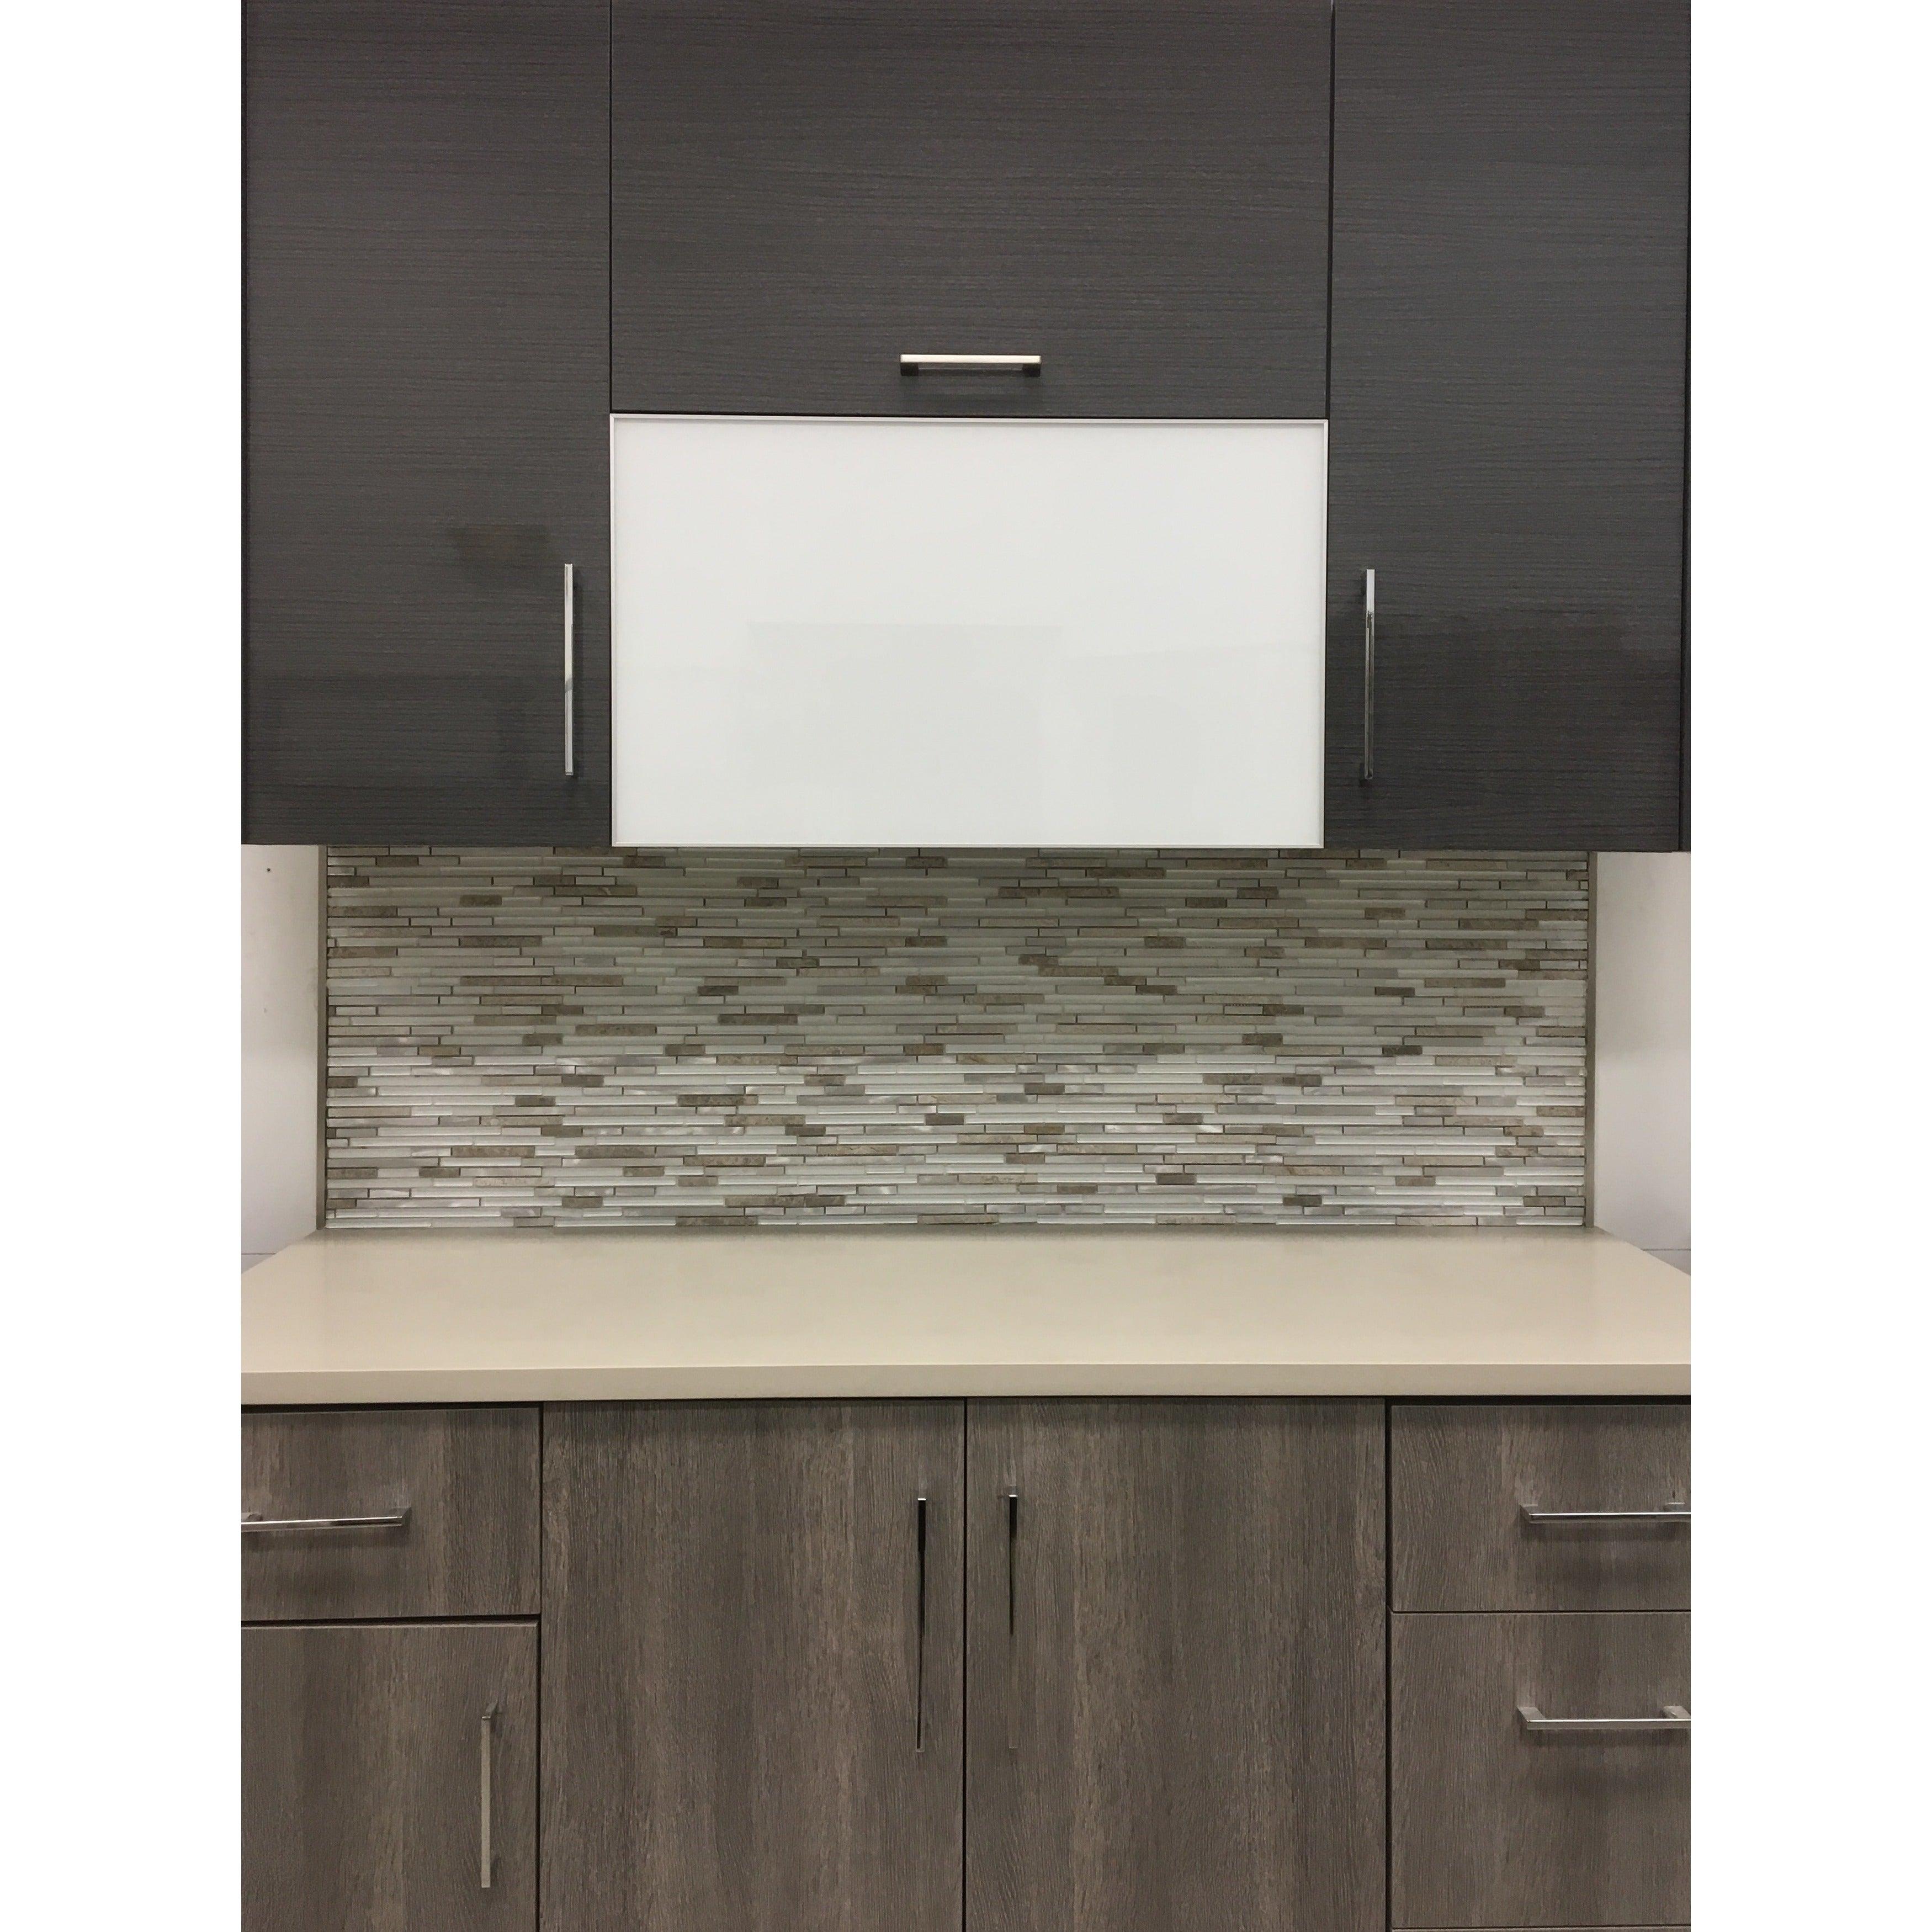 Shop Martini Mosaic Riga Dazzle Stone 12 x 12-inch Backsplash Tile on